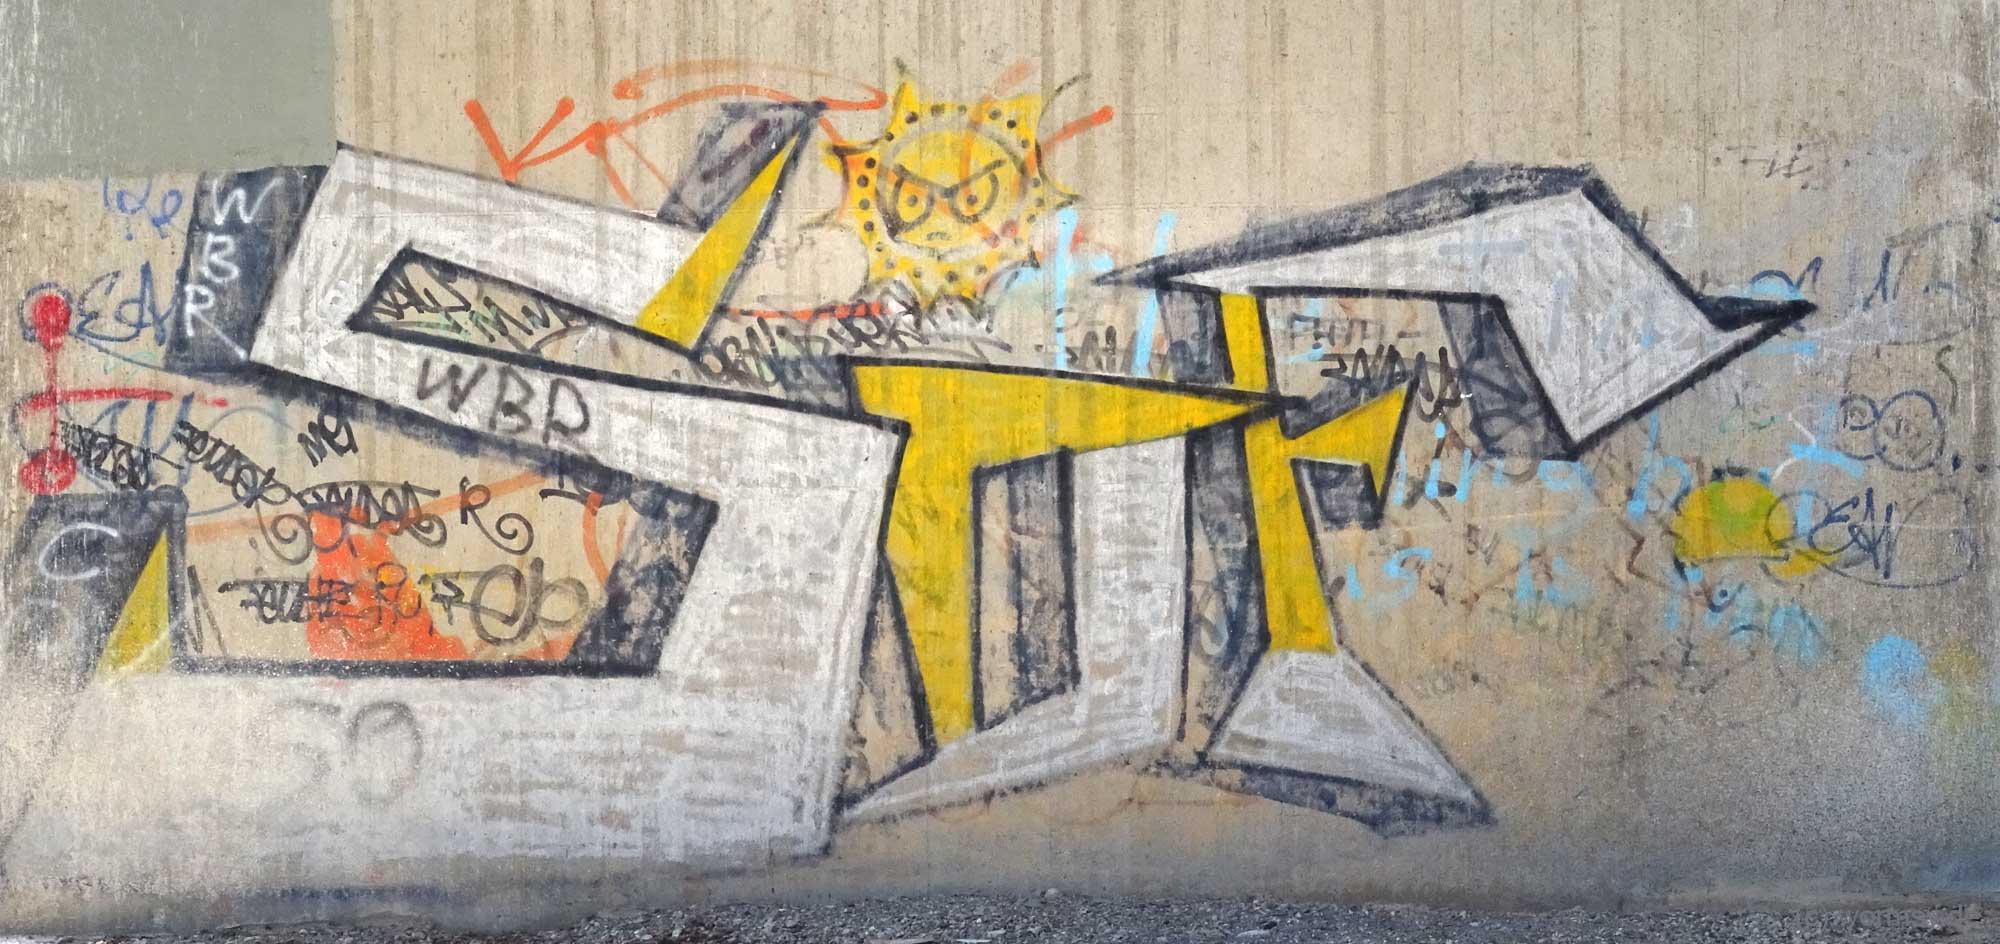 Graffiti unter der Talbrücke Pfeddersheim - SOF